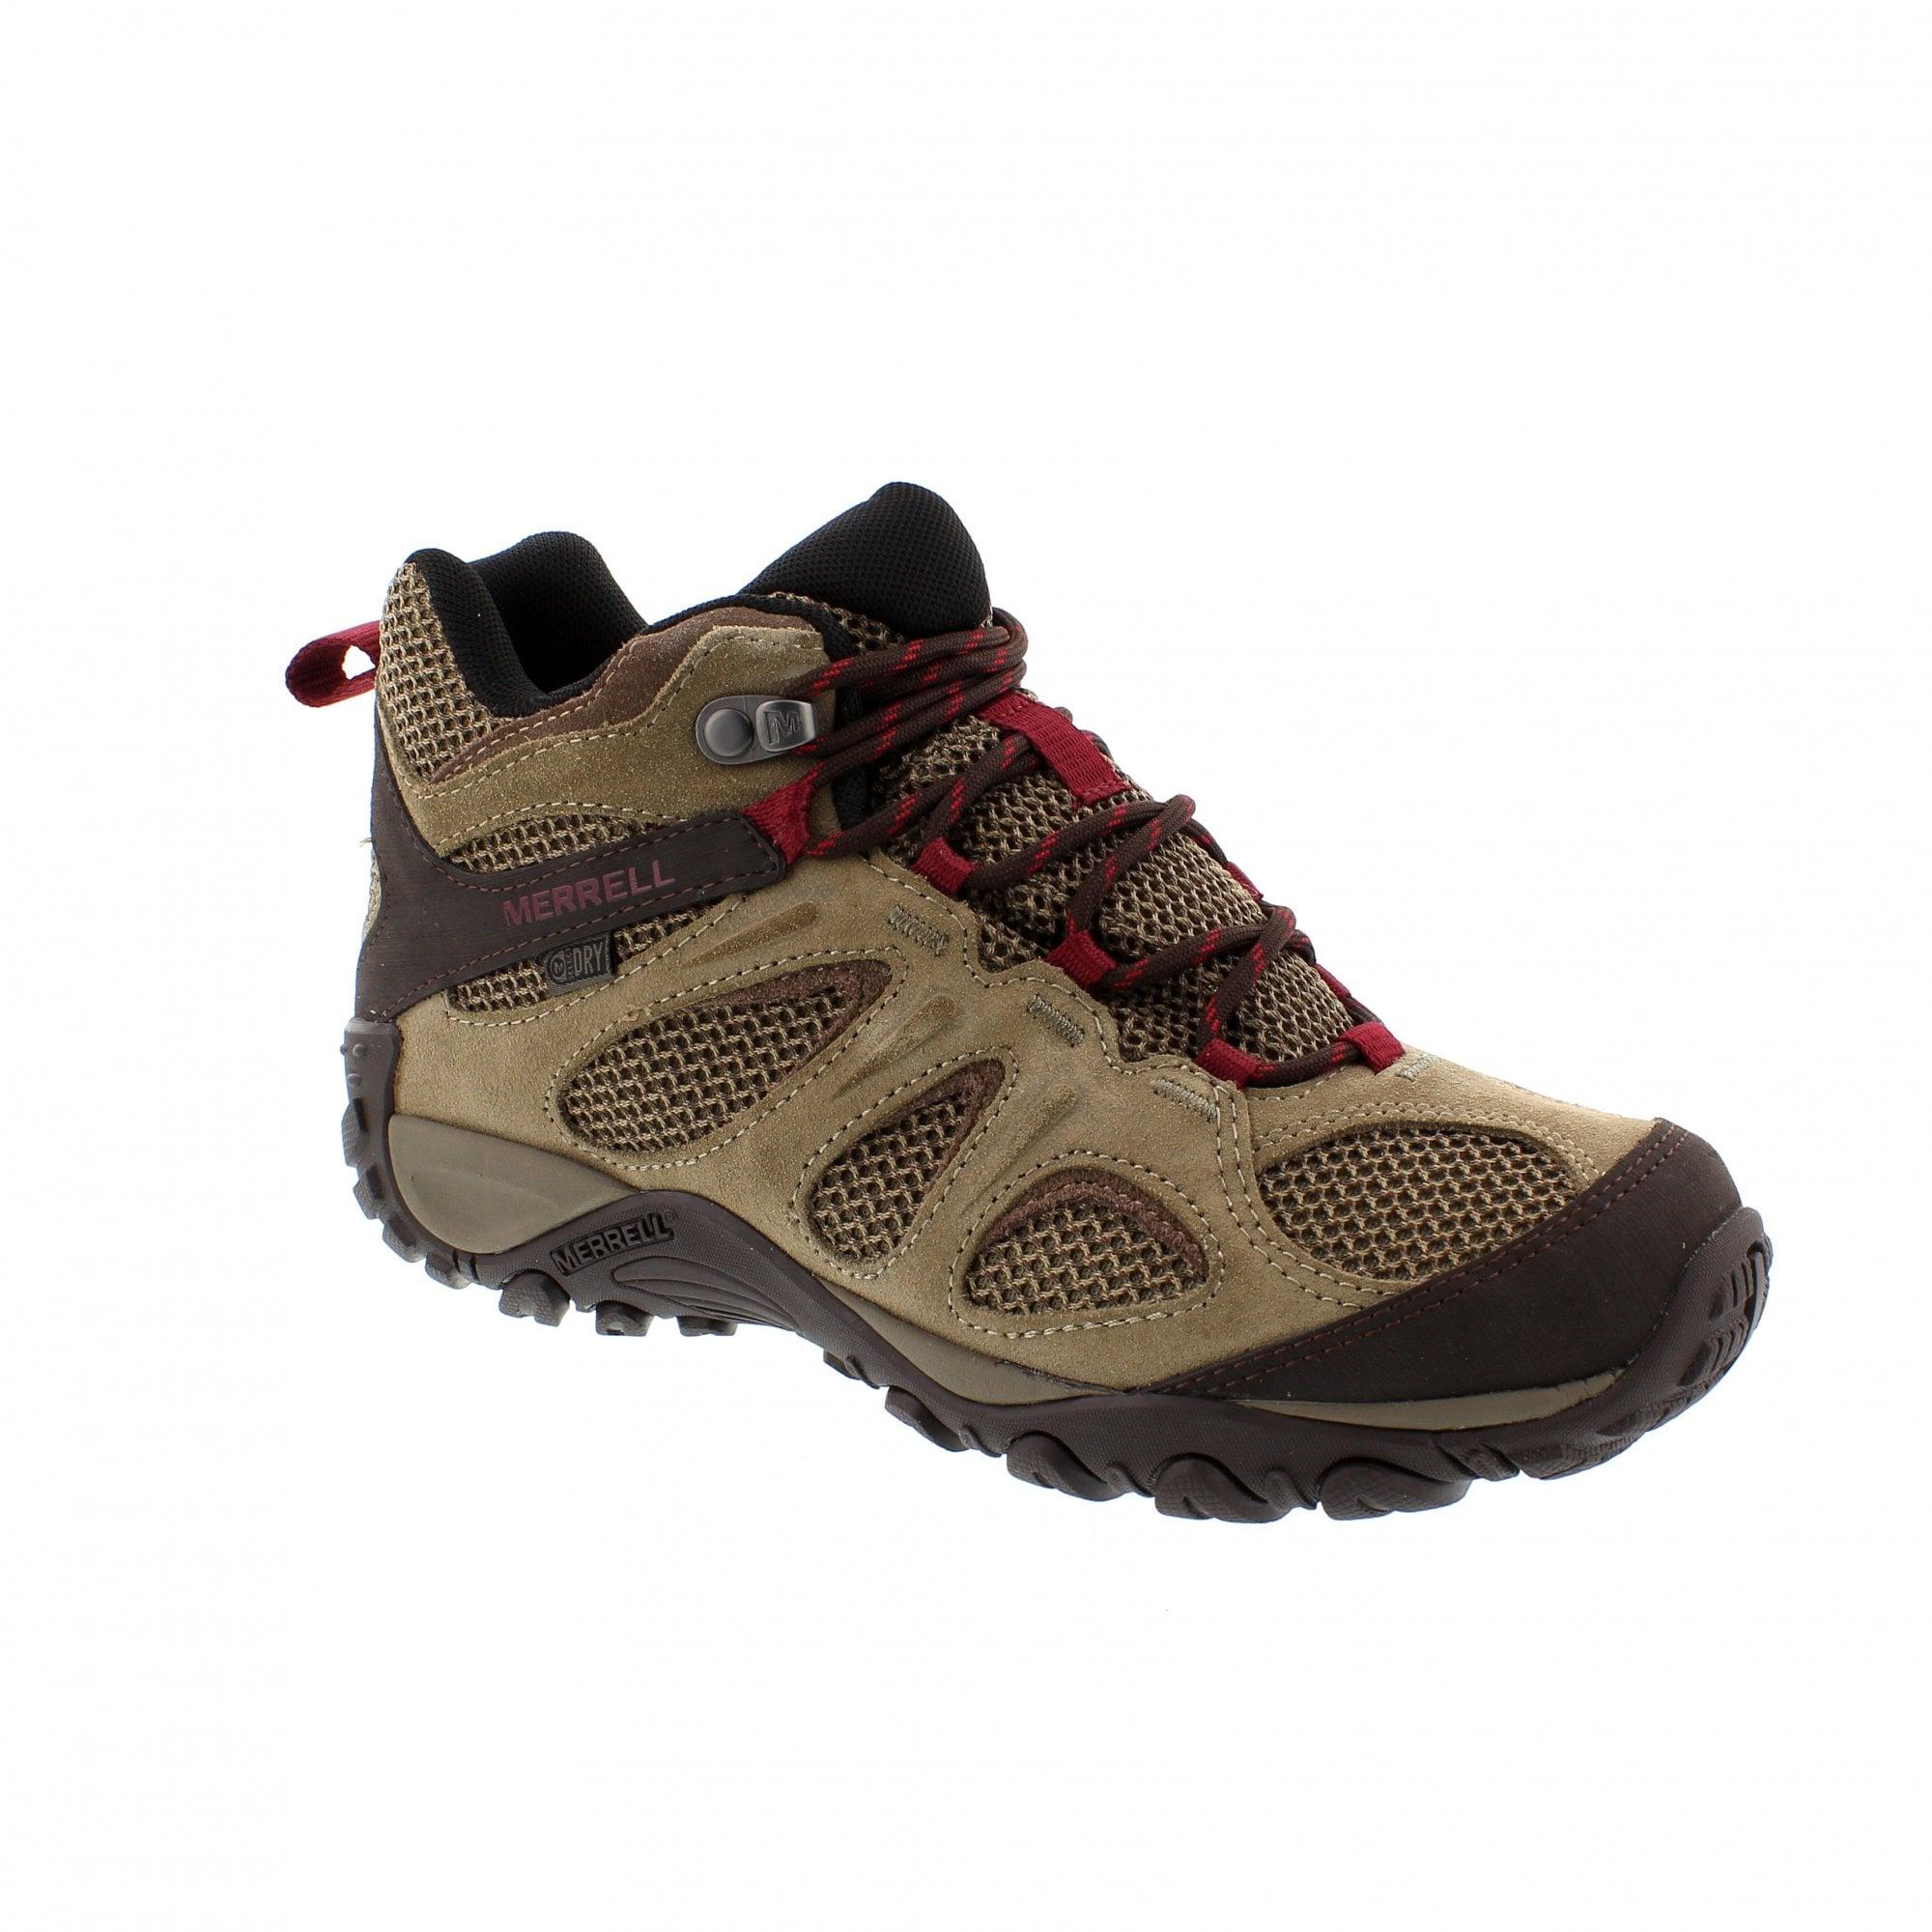 443f4620bf3ef Merrell Yokota 2 Mid Waterproof | J77388 - Womens from Rogerson Shoes UK